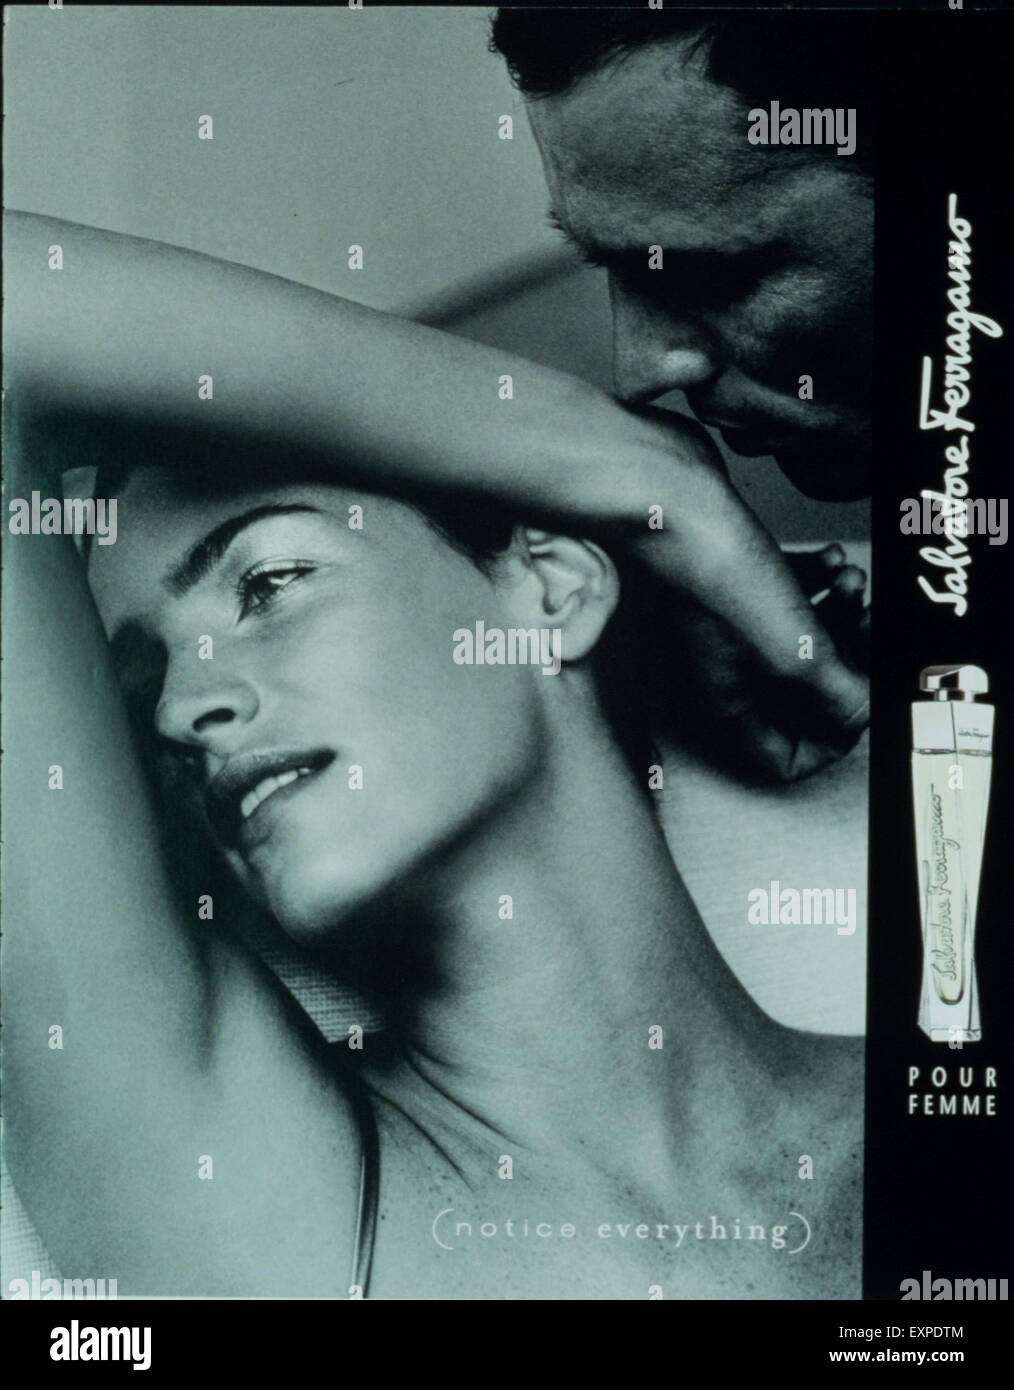 2000s UK Salvatore Ferragamo Magazine Advert - Stock Image